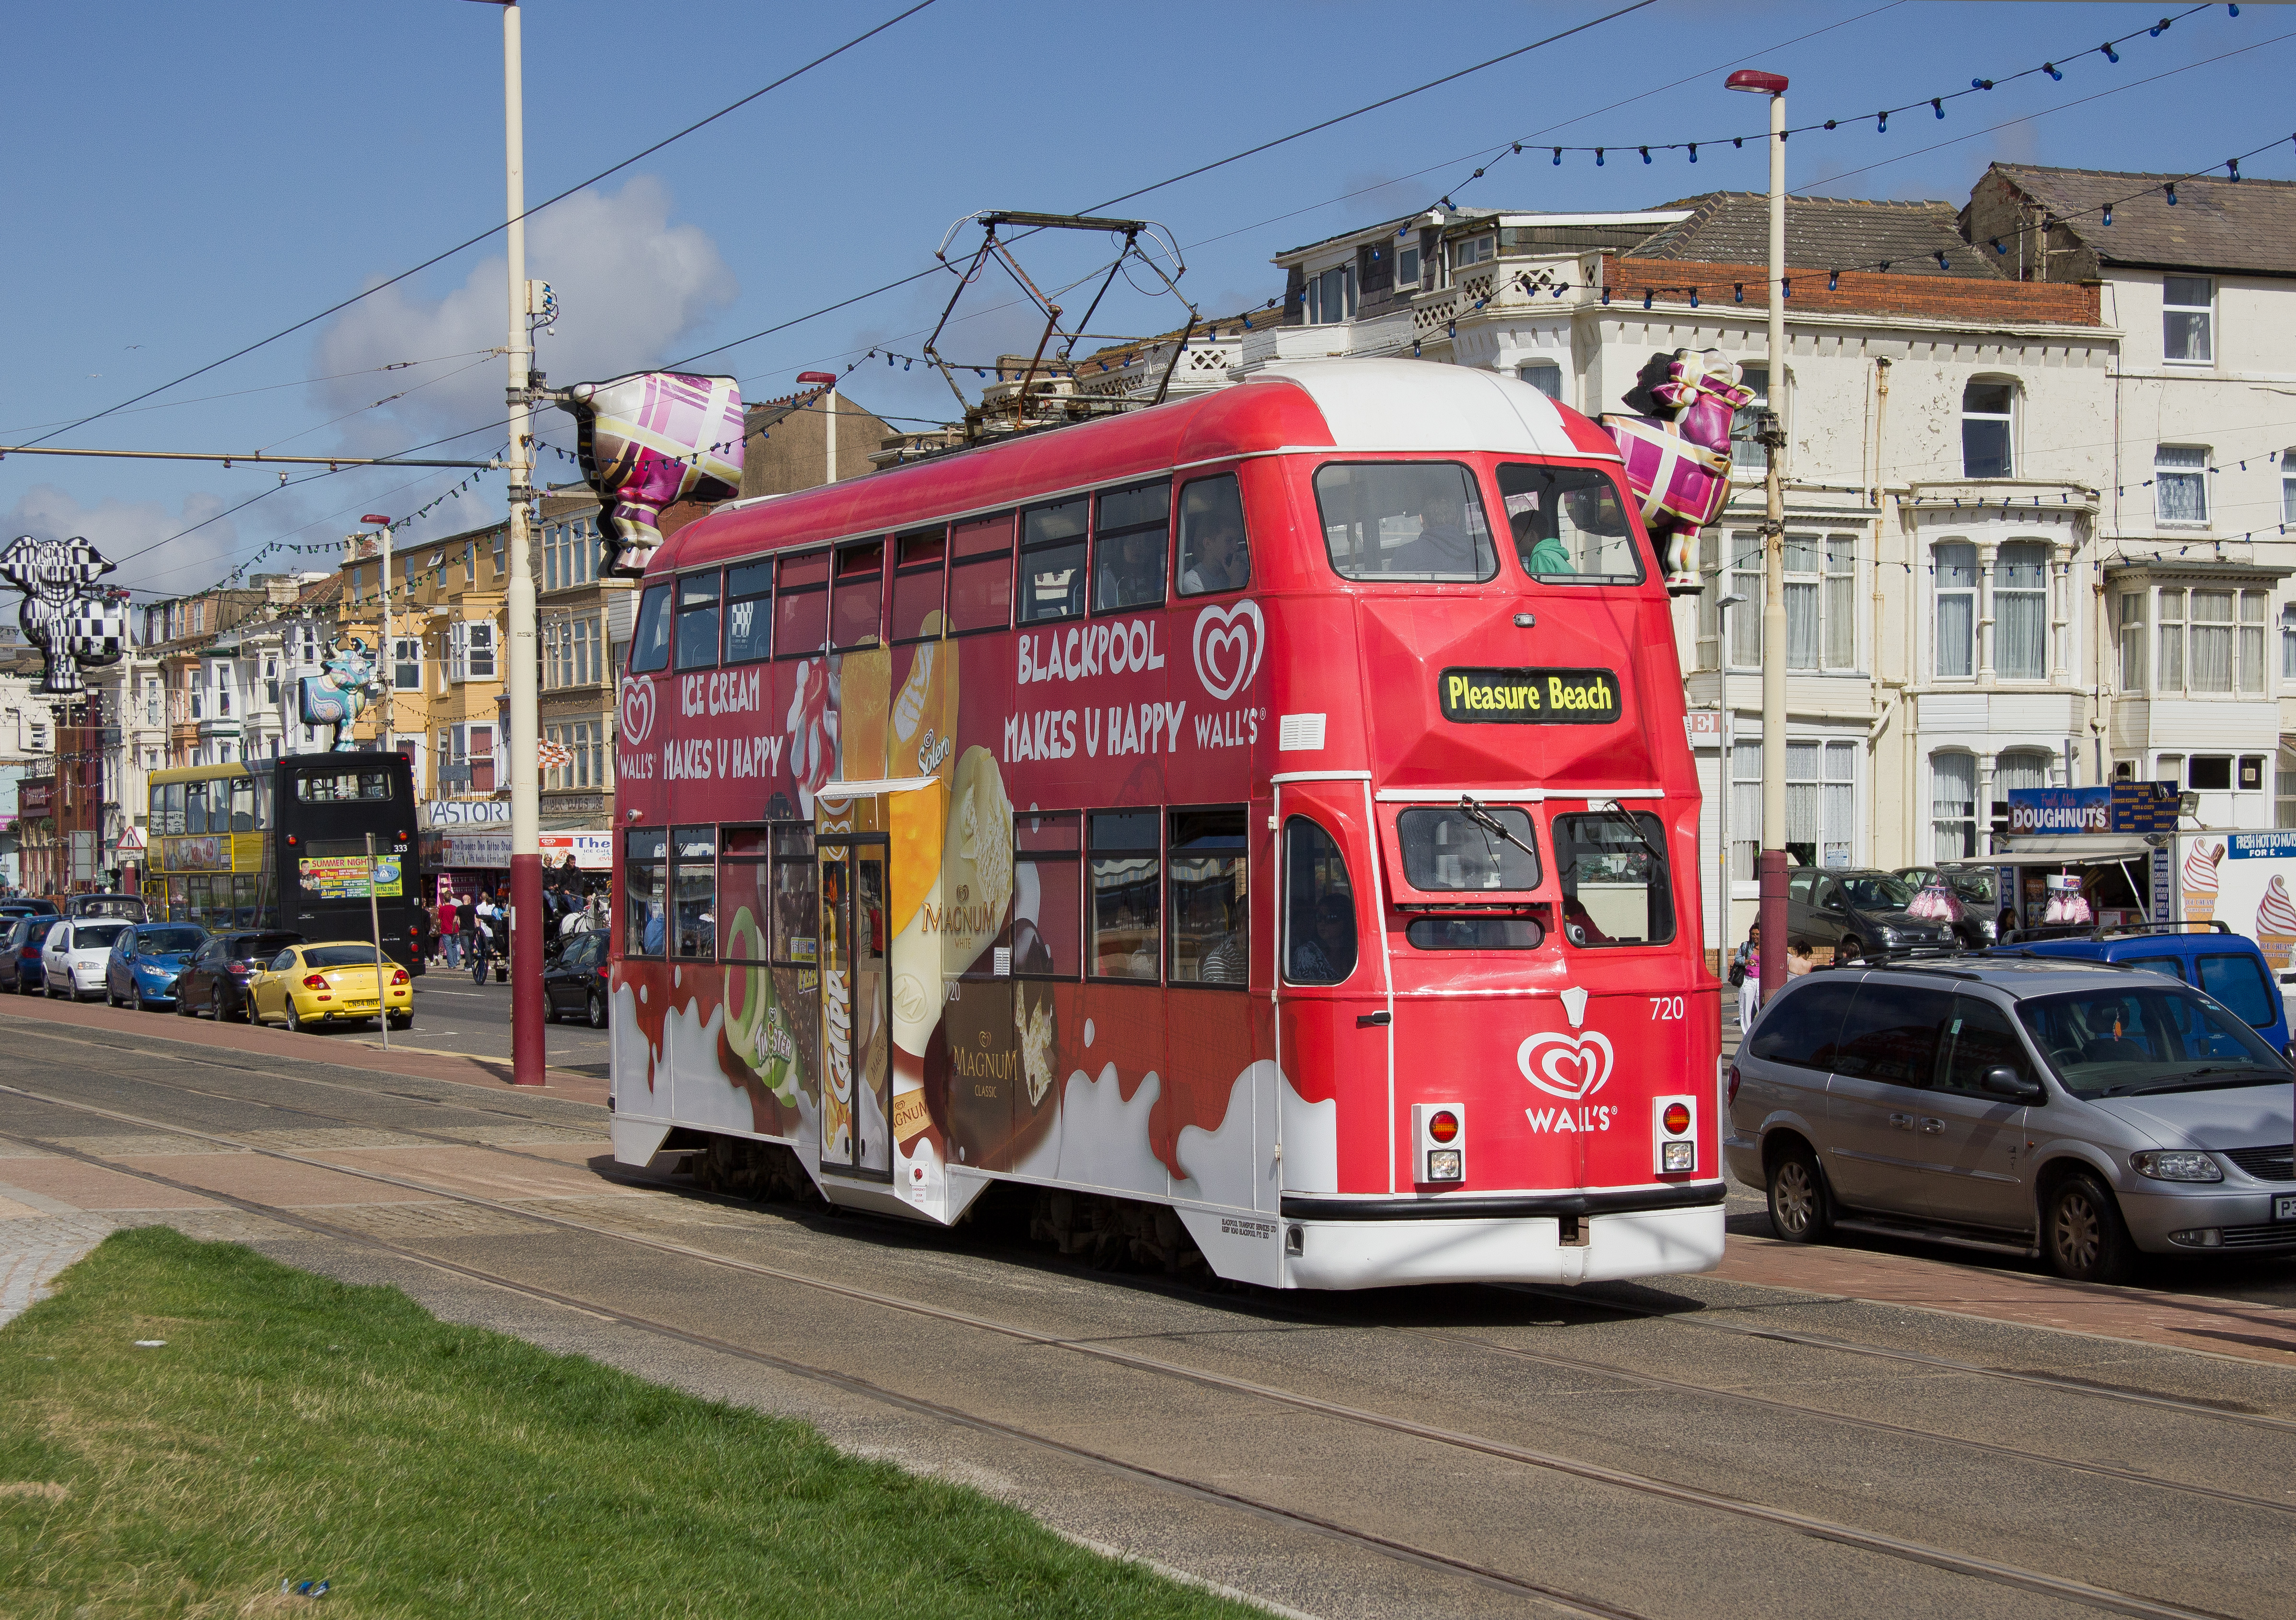 Blackpool_tram_720_,_Promenade.jpg